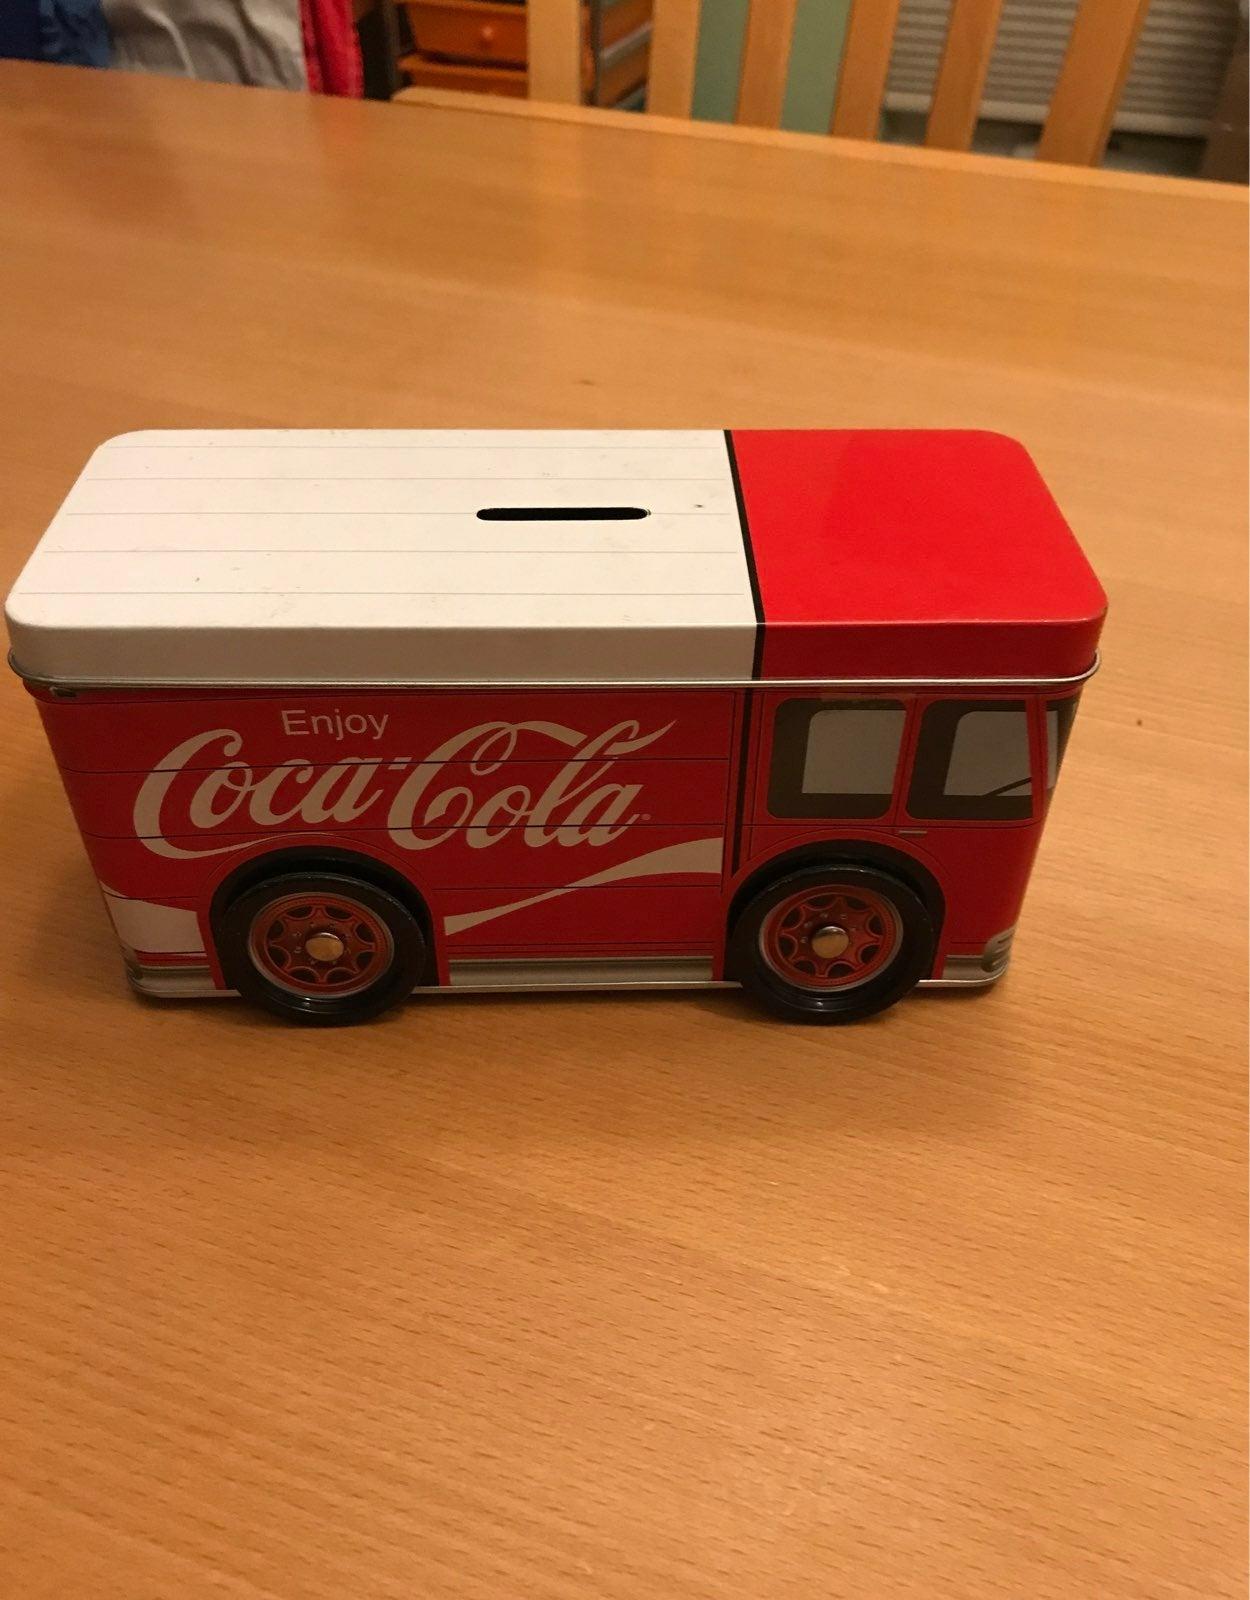 Coco cola truck bank